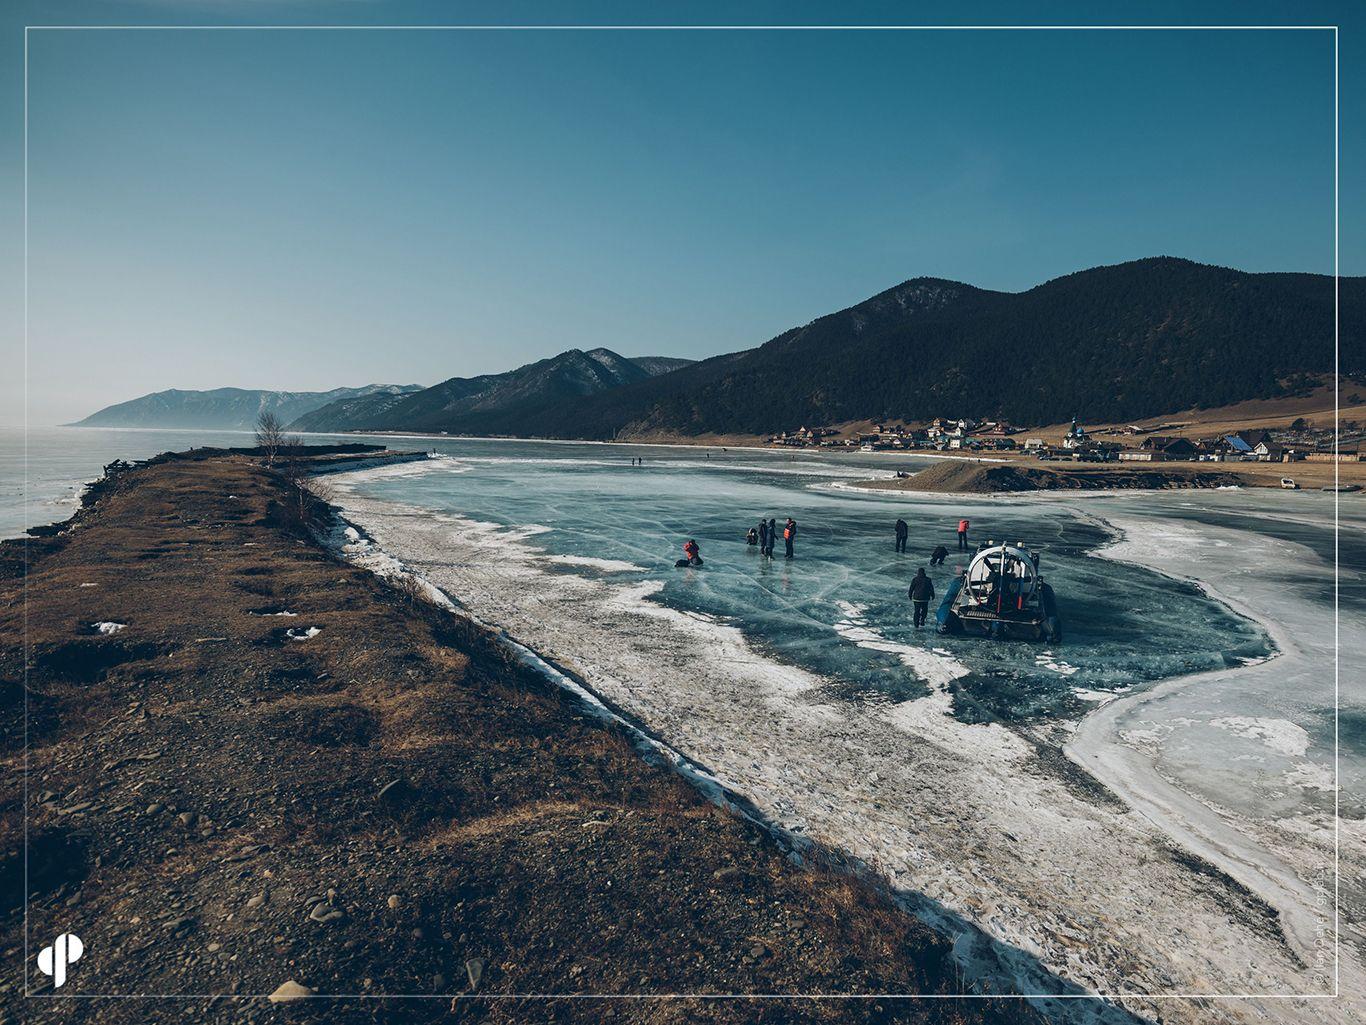 Voyage Baikal : rencontre avec le Baikal